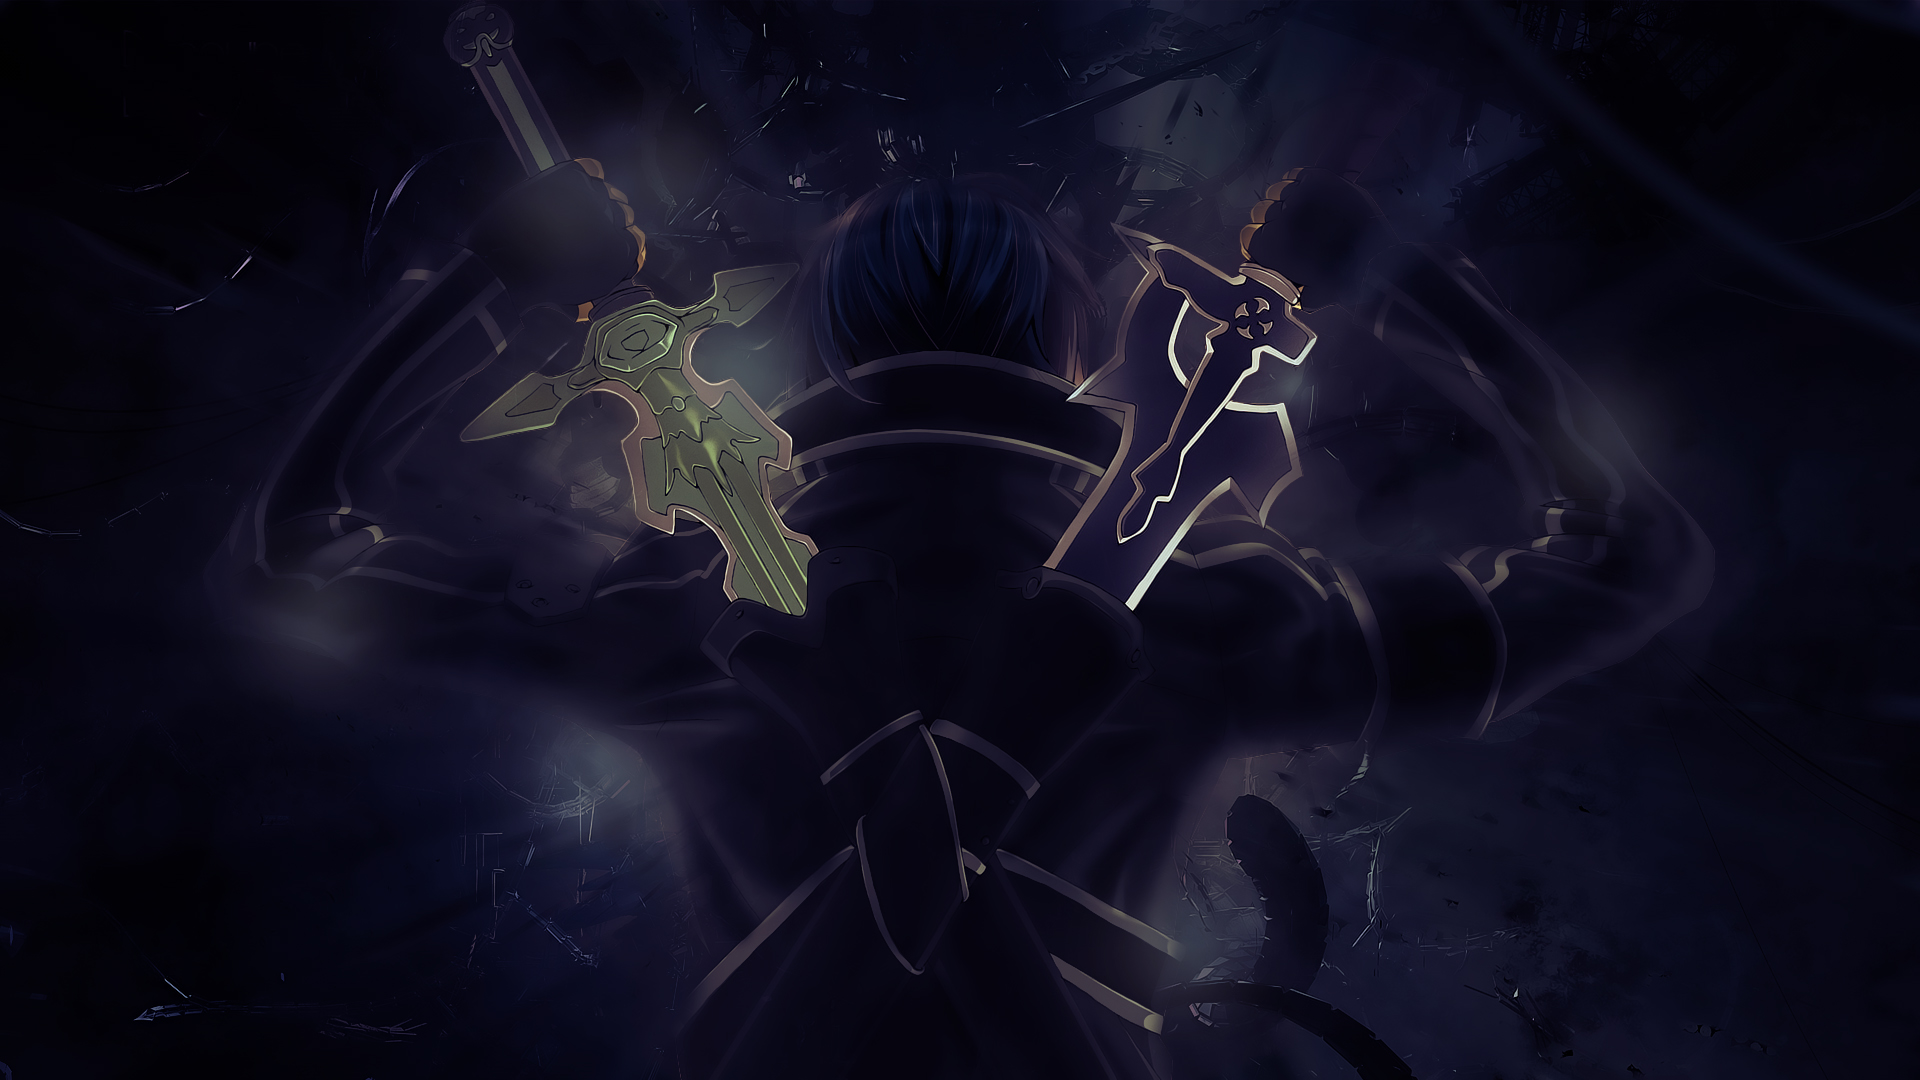 sword_art_online___kirito_wallpaper_hd_by_mikedu44800-d5jam5c